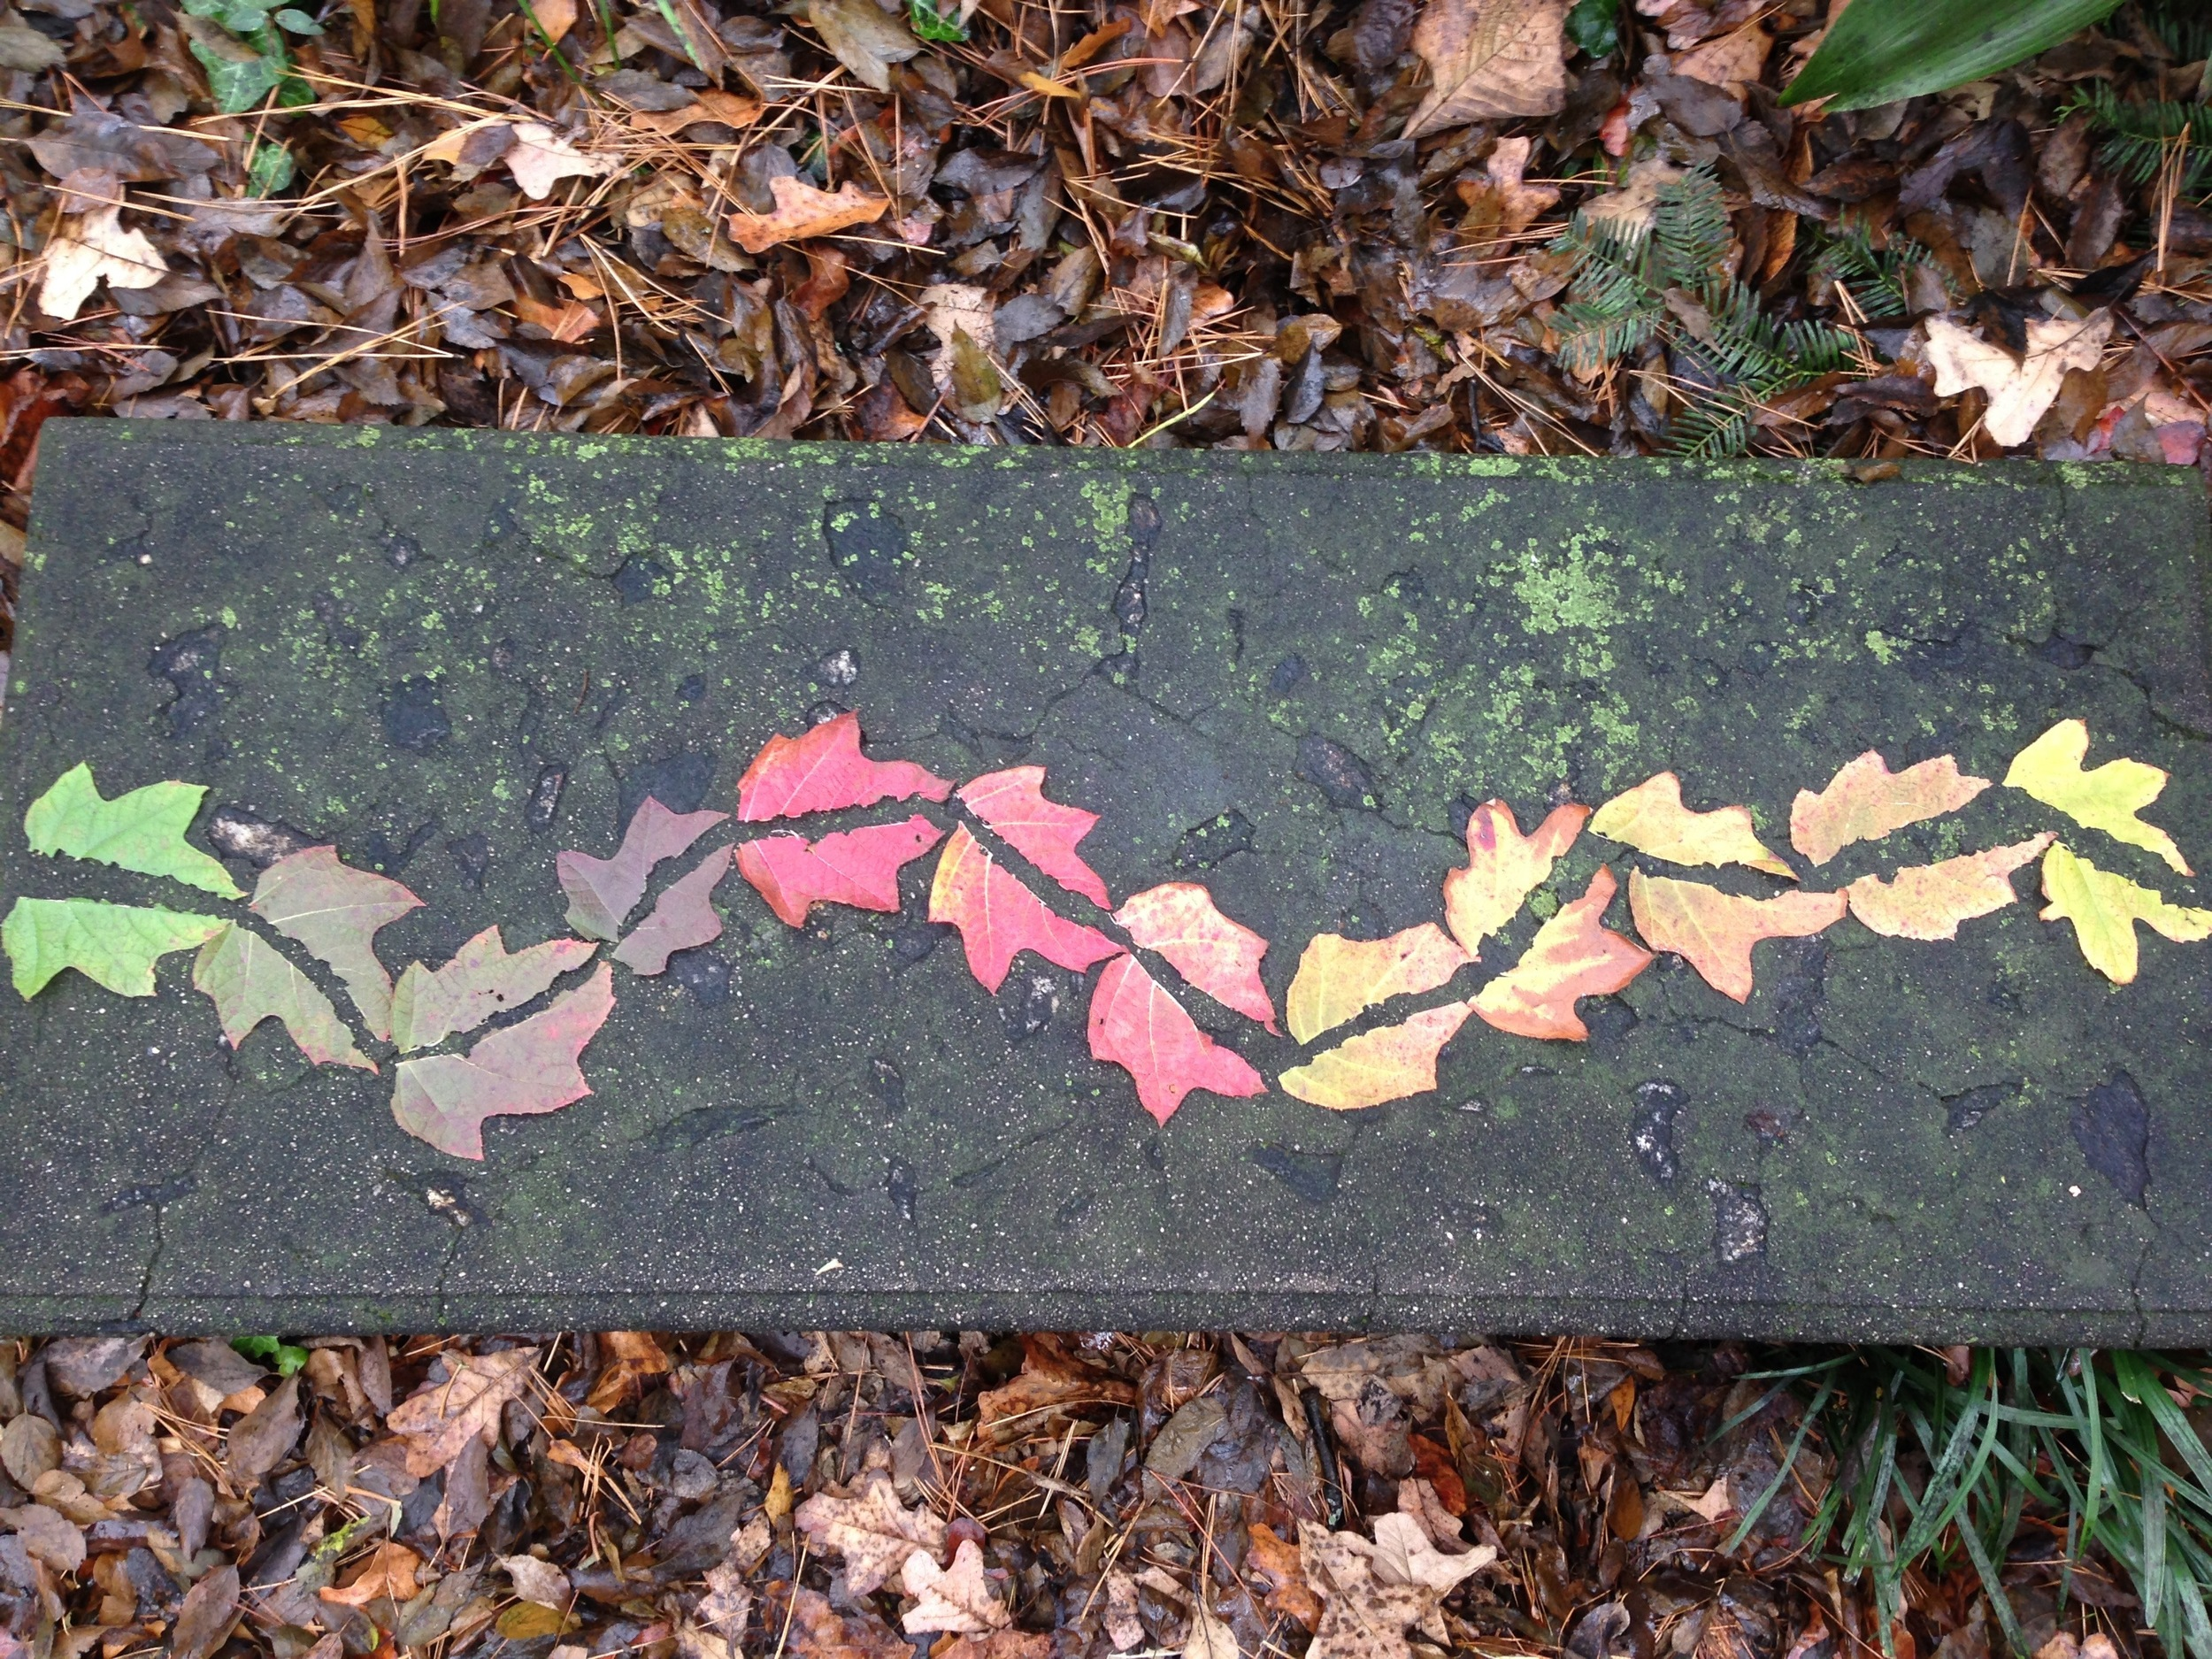 Leaves in stone bench. Garden Club of Georgia Founder's Garden. Athens, GA. Fall 2013.